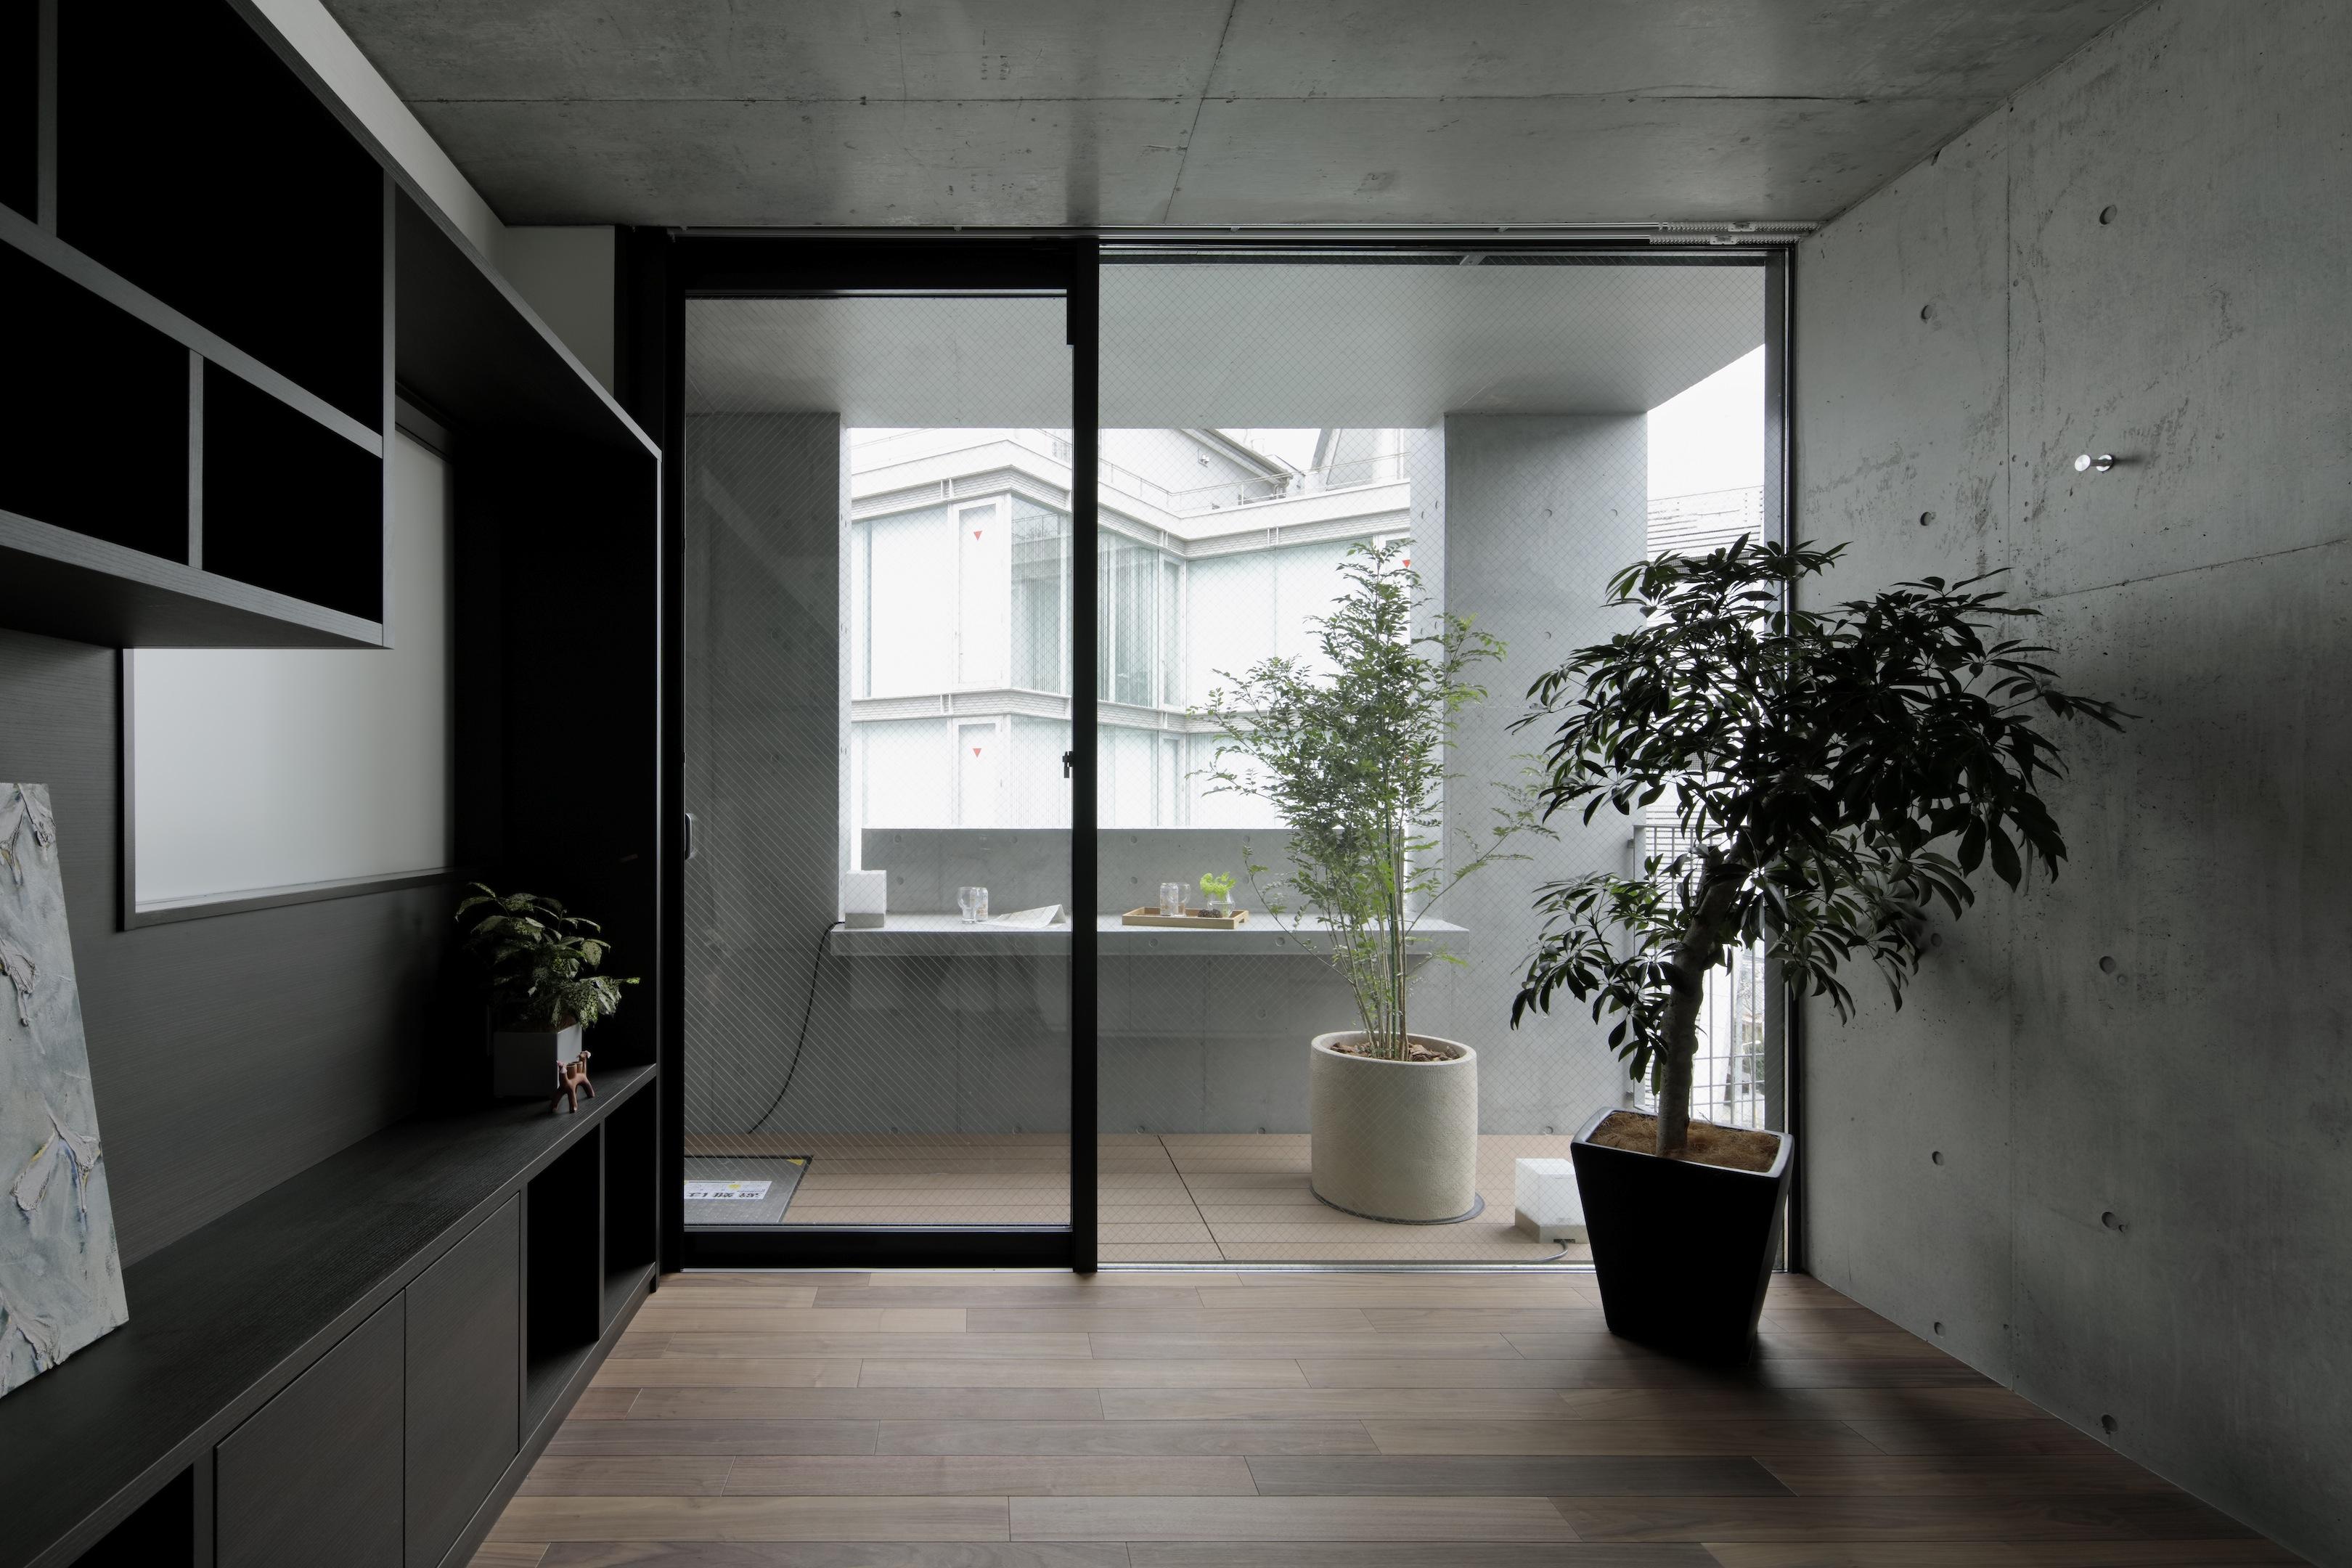 windowgarden_013